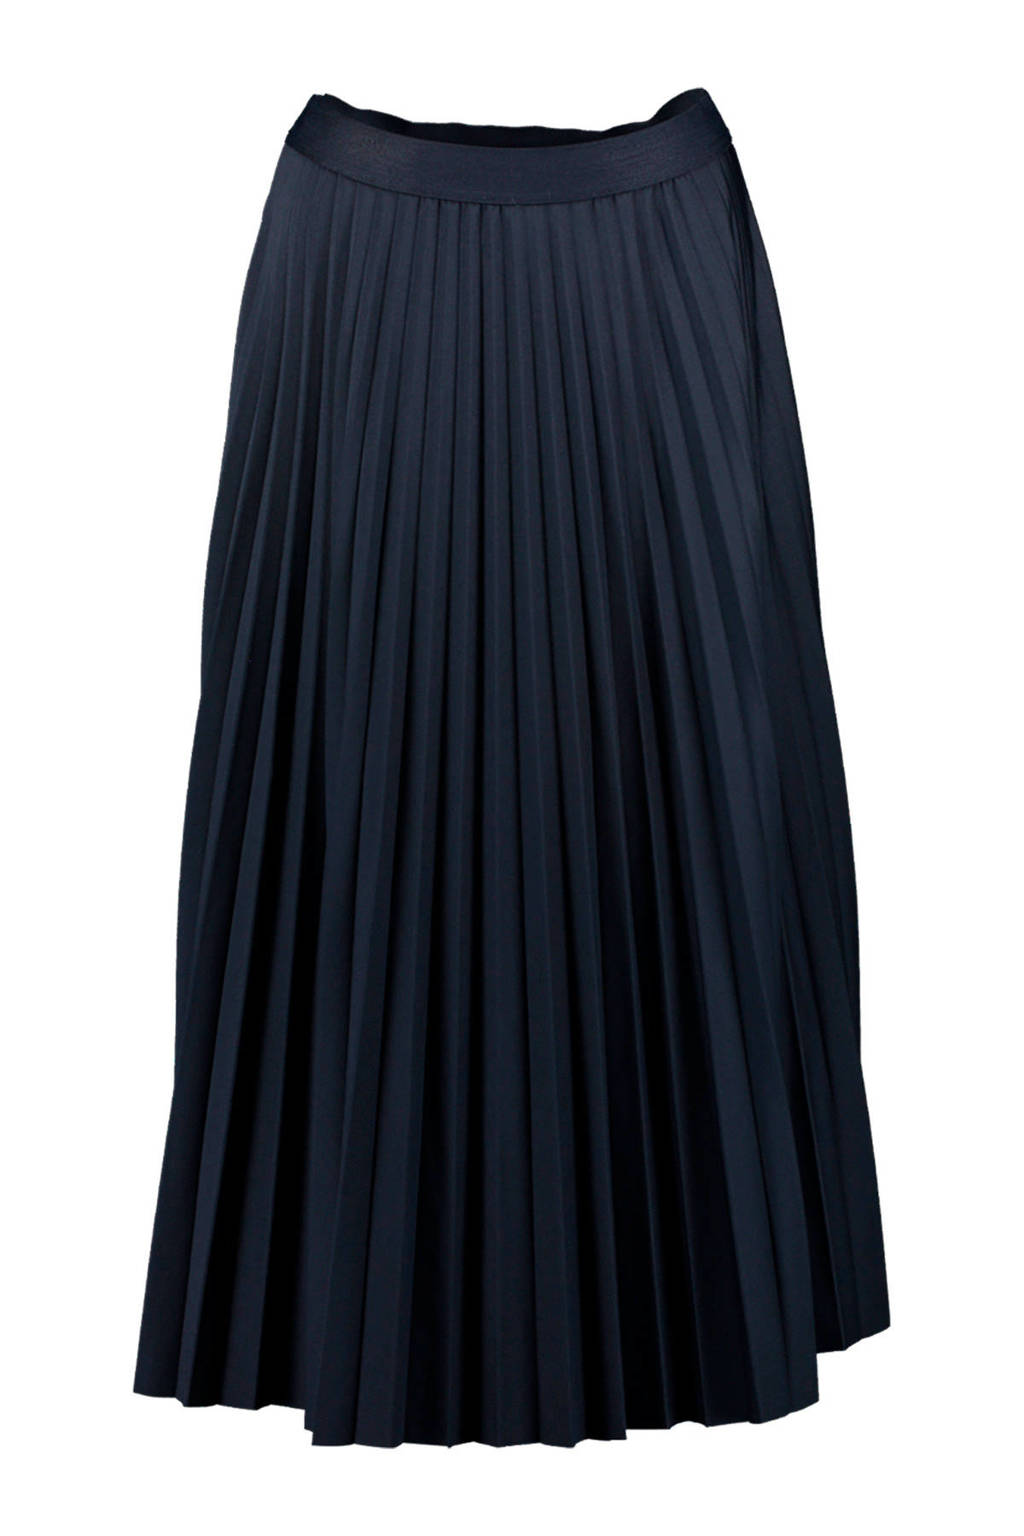 Re-Draft plissé rok donkerblauw, Donkerblauw